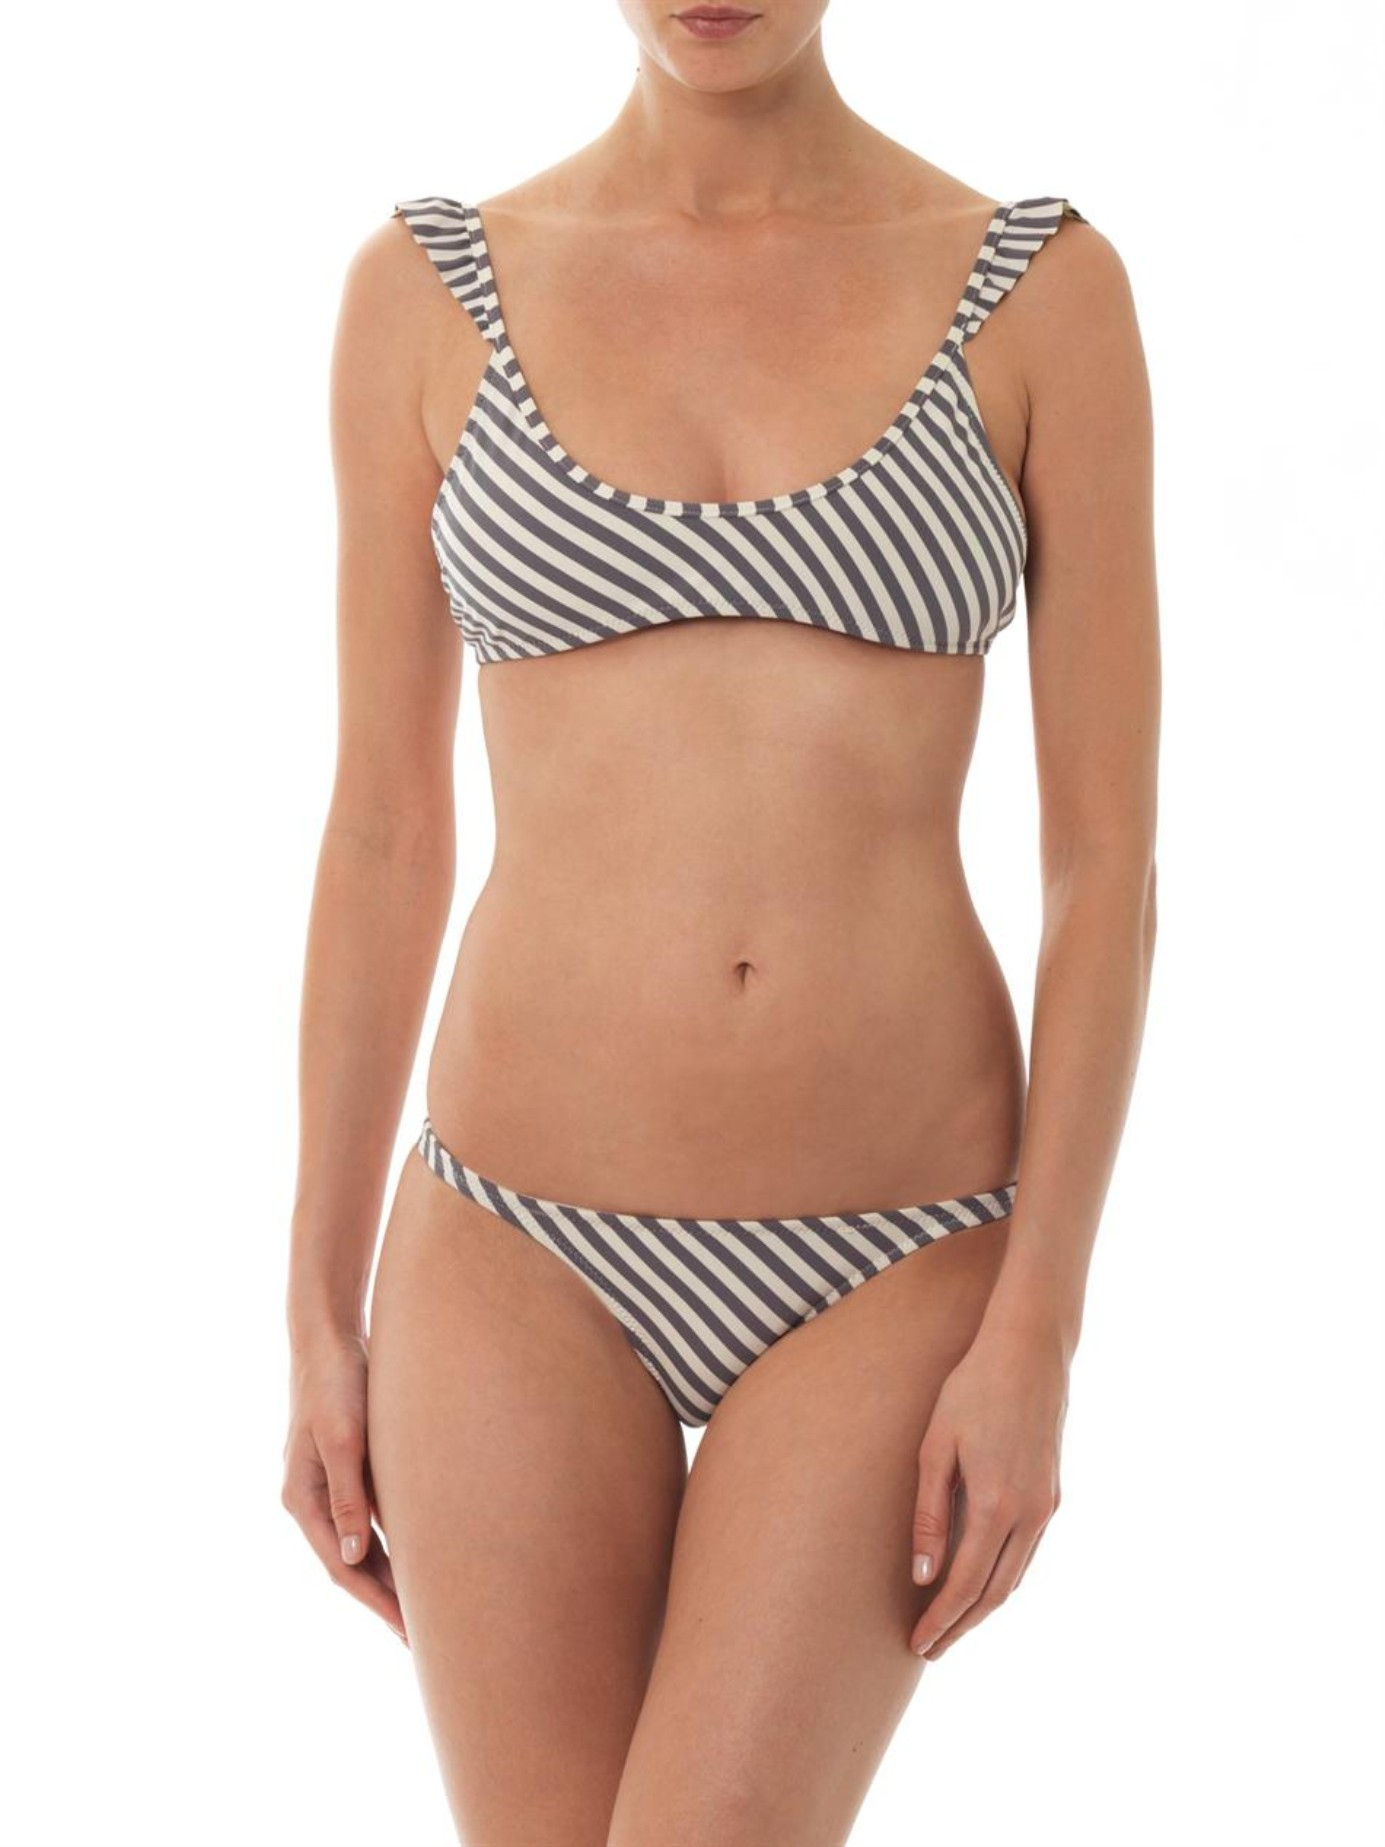 1644f3783a800 Made By Dawn Petal Striped Bikini Top in Gray - Lyst